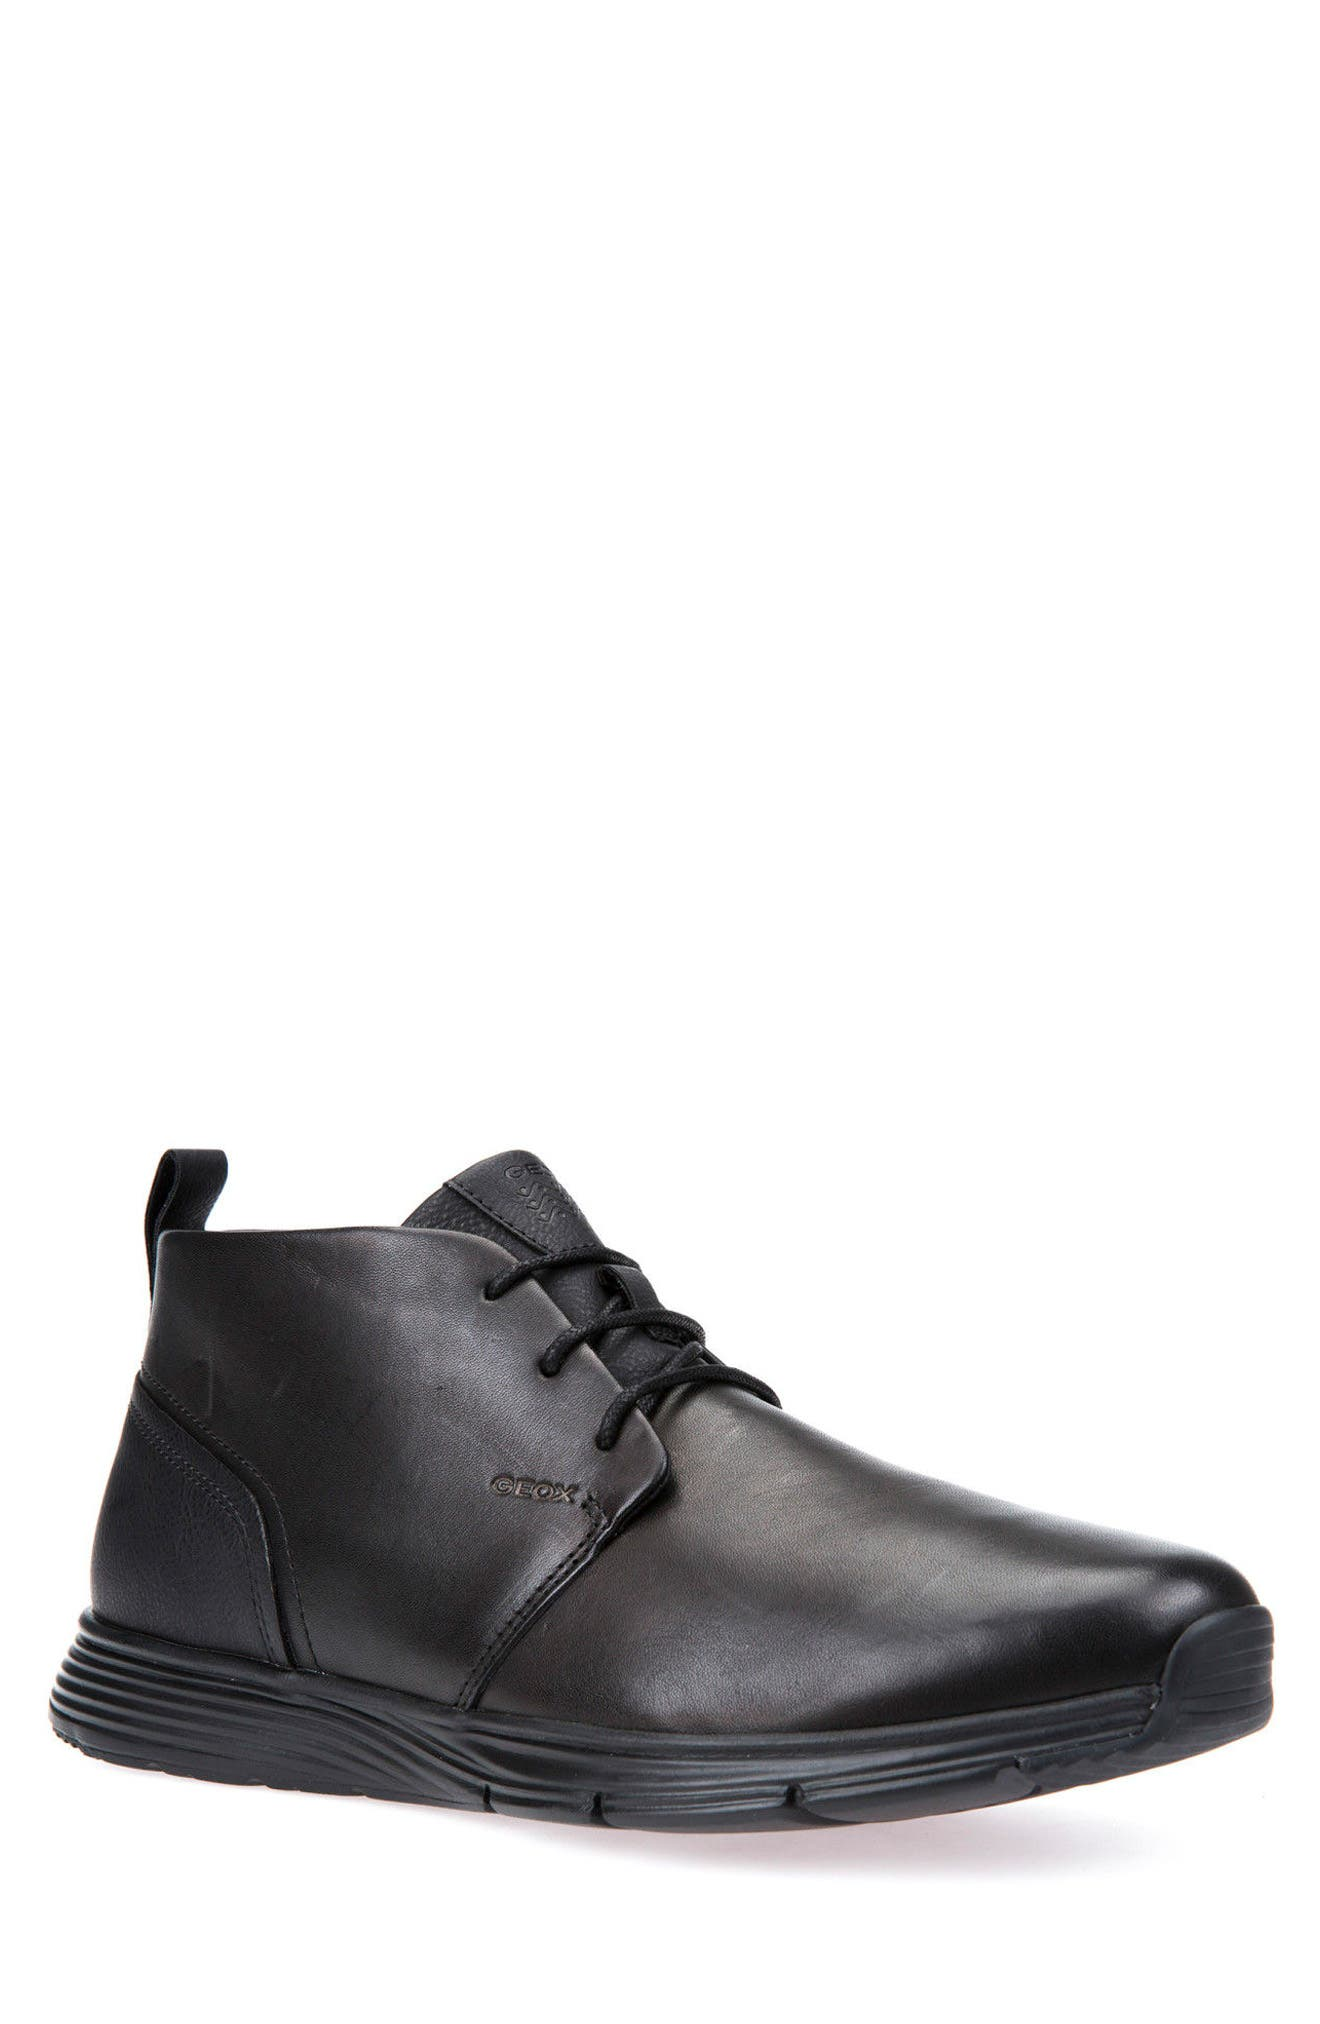 Snapish 7 Boot,                         Main,                         color, 001